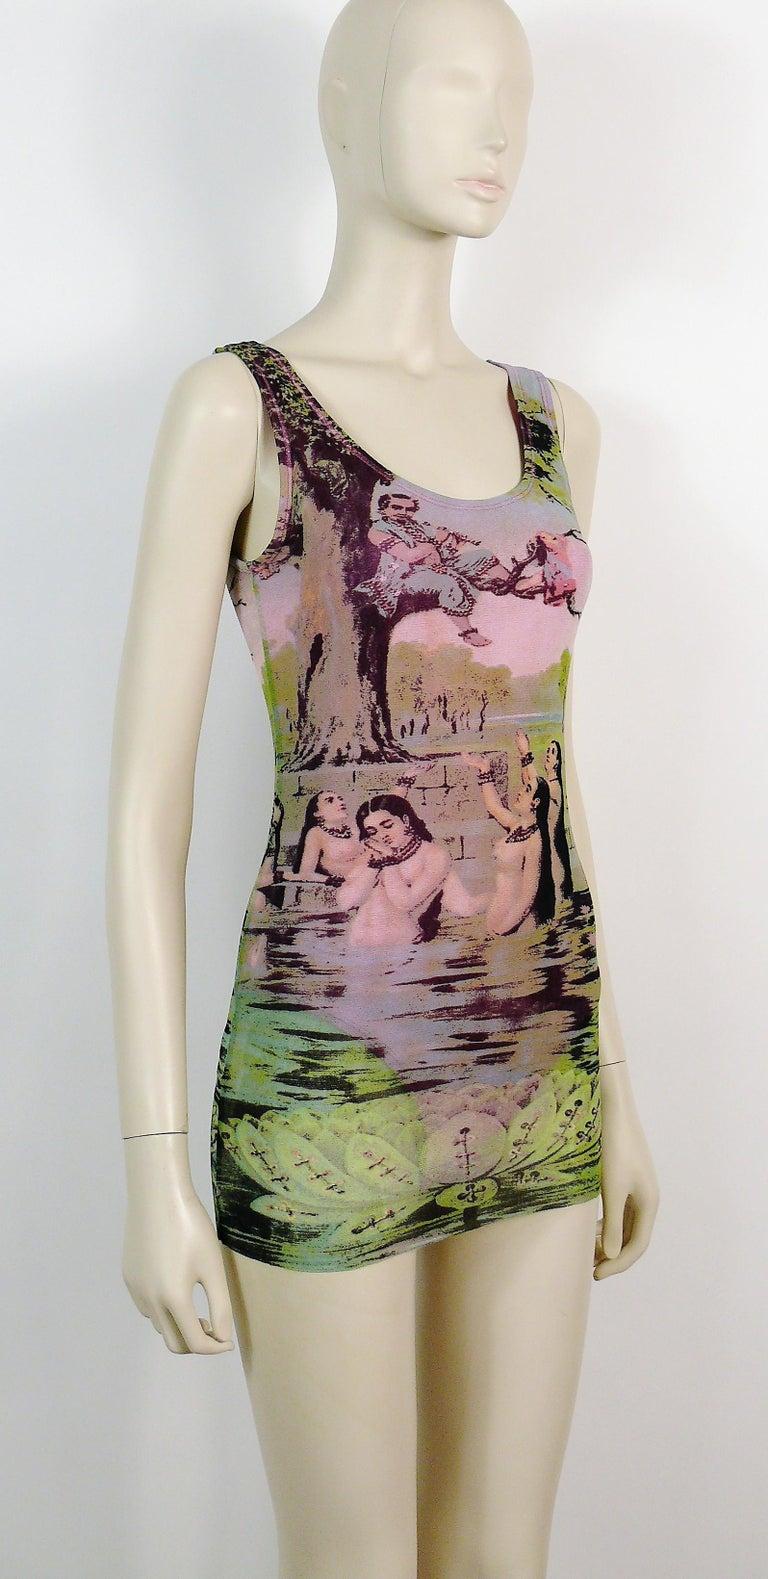 Brown Jean Paul Gaultier Vintage Oriental Bath Print Mesh Tank Micro Mini Dress Size L For Sale